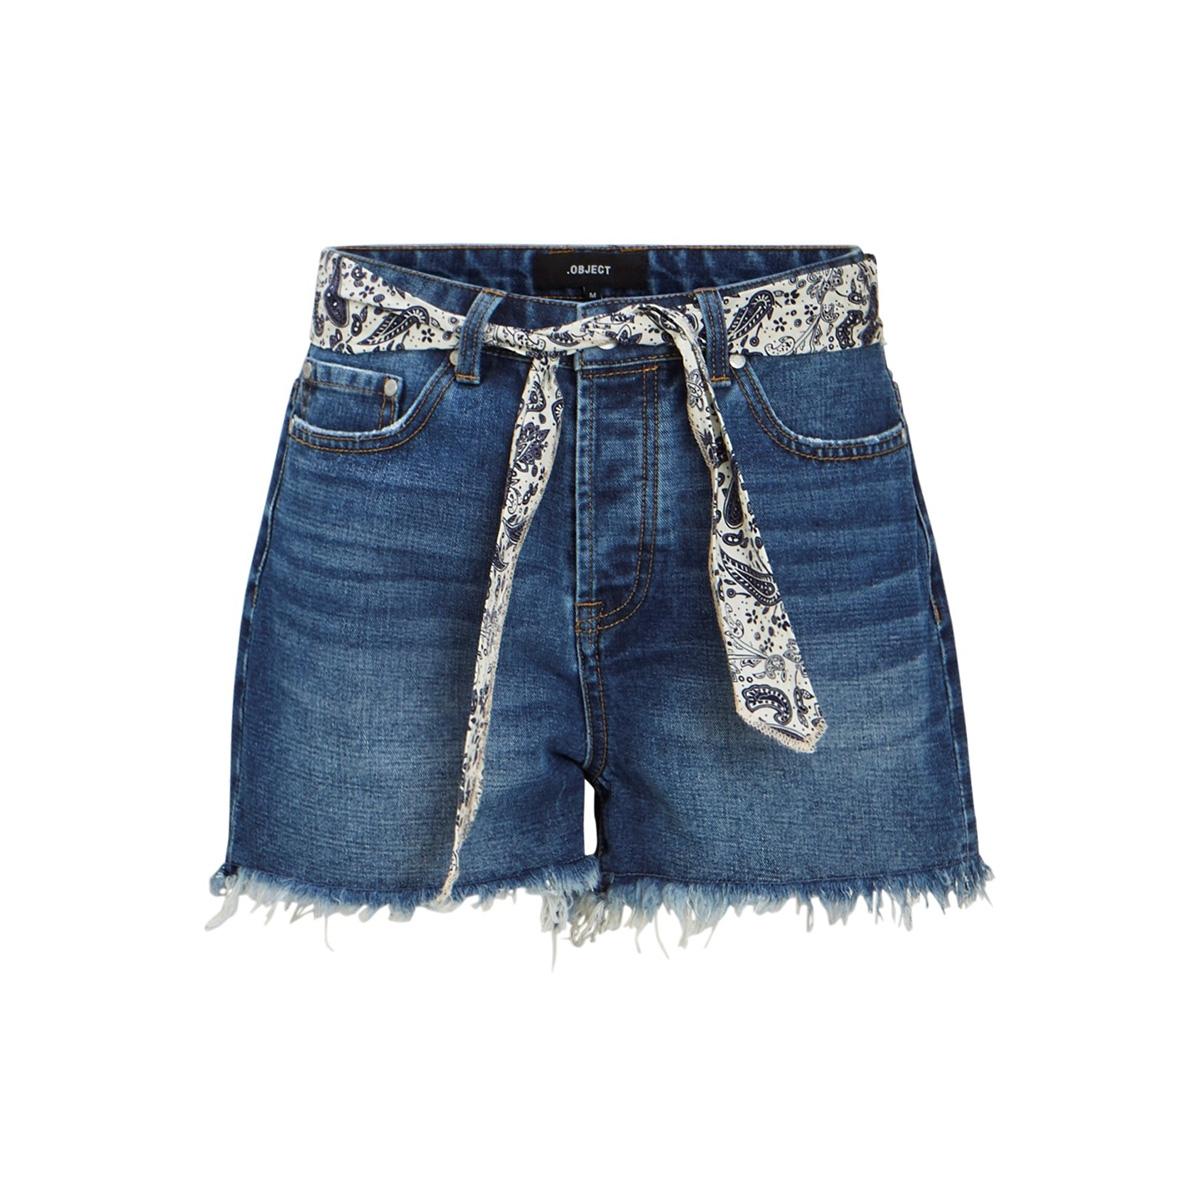 objfilisa mw denim shorts a sp 23030629 object korte broek medium blue denim